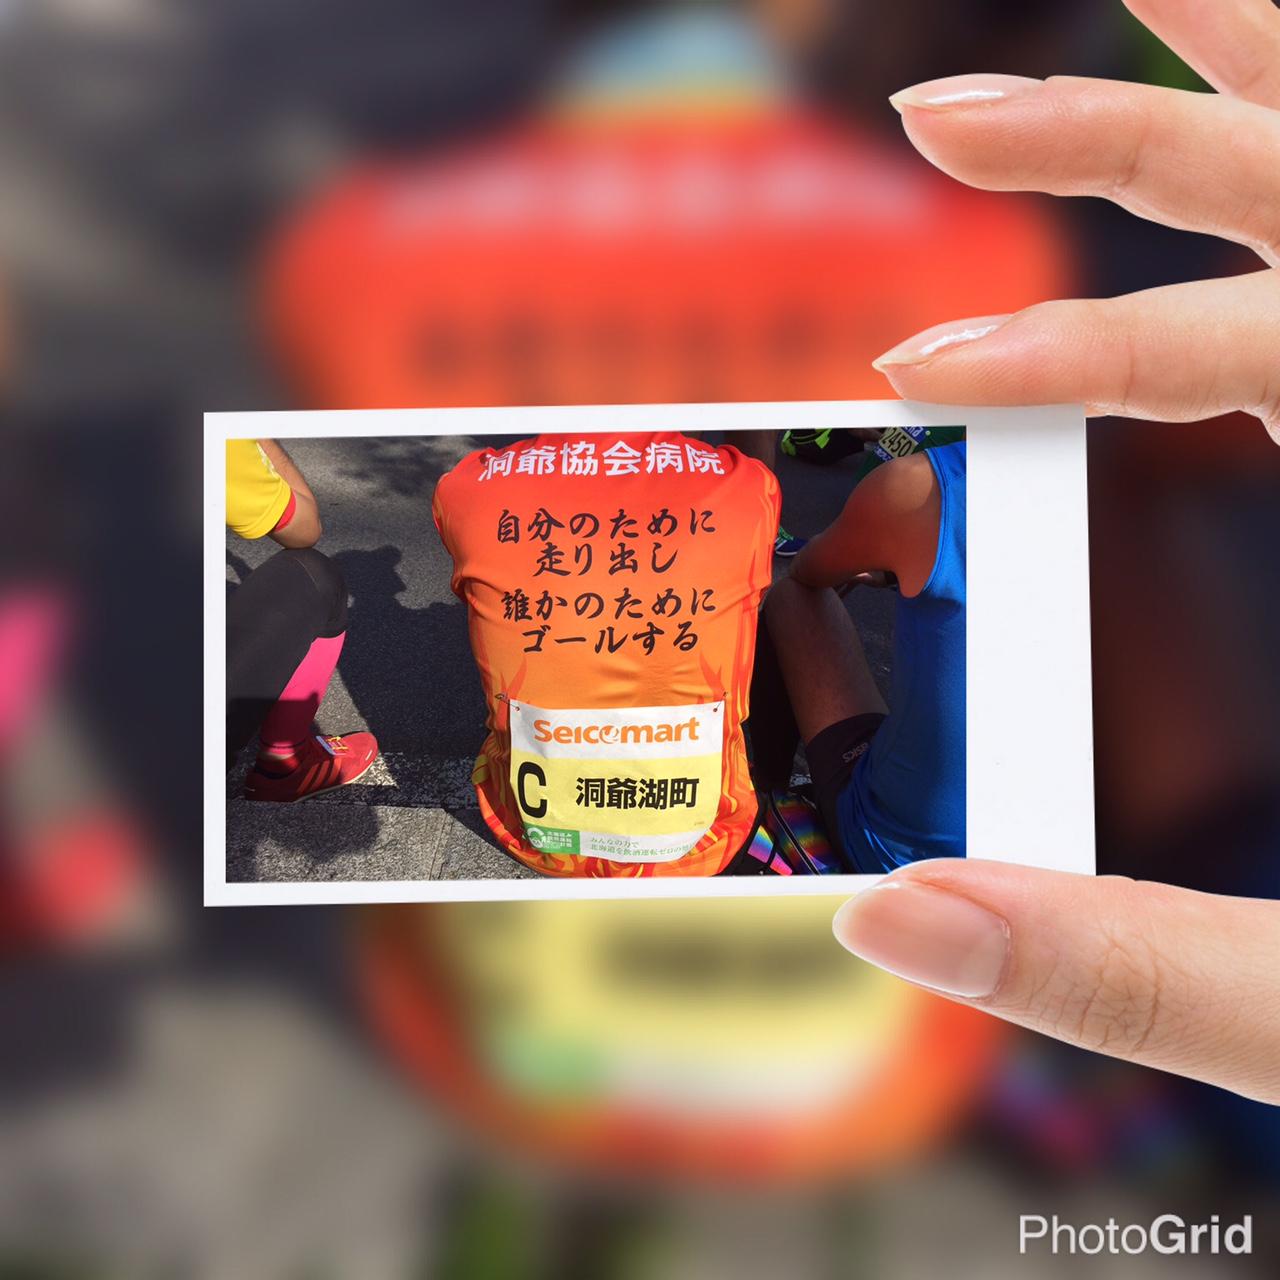 image17_20160909001427131.jpg